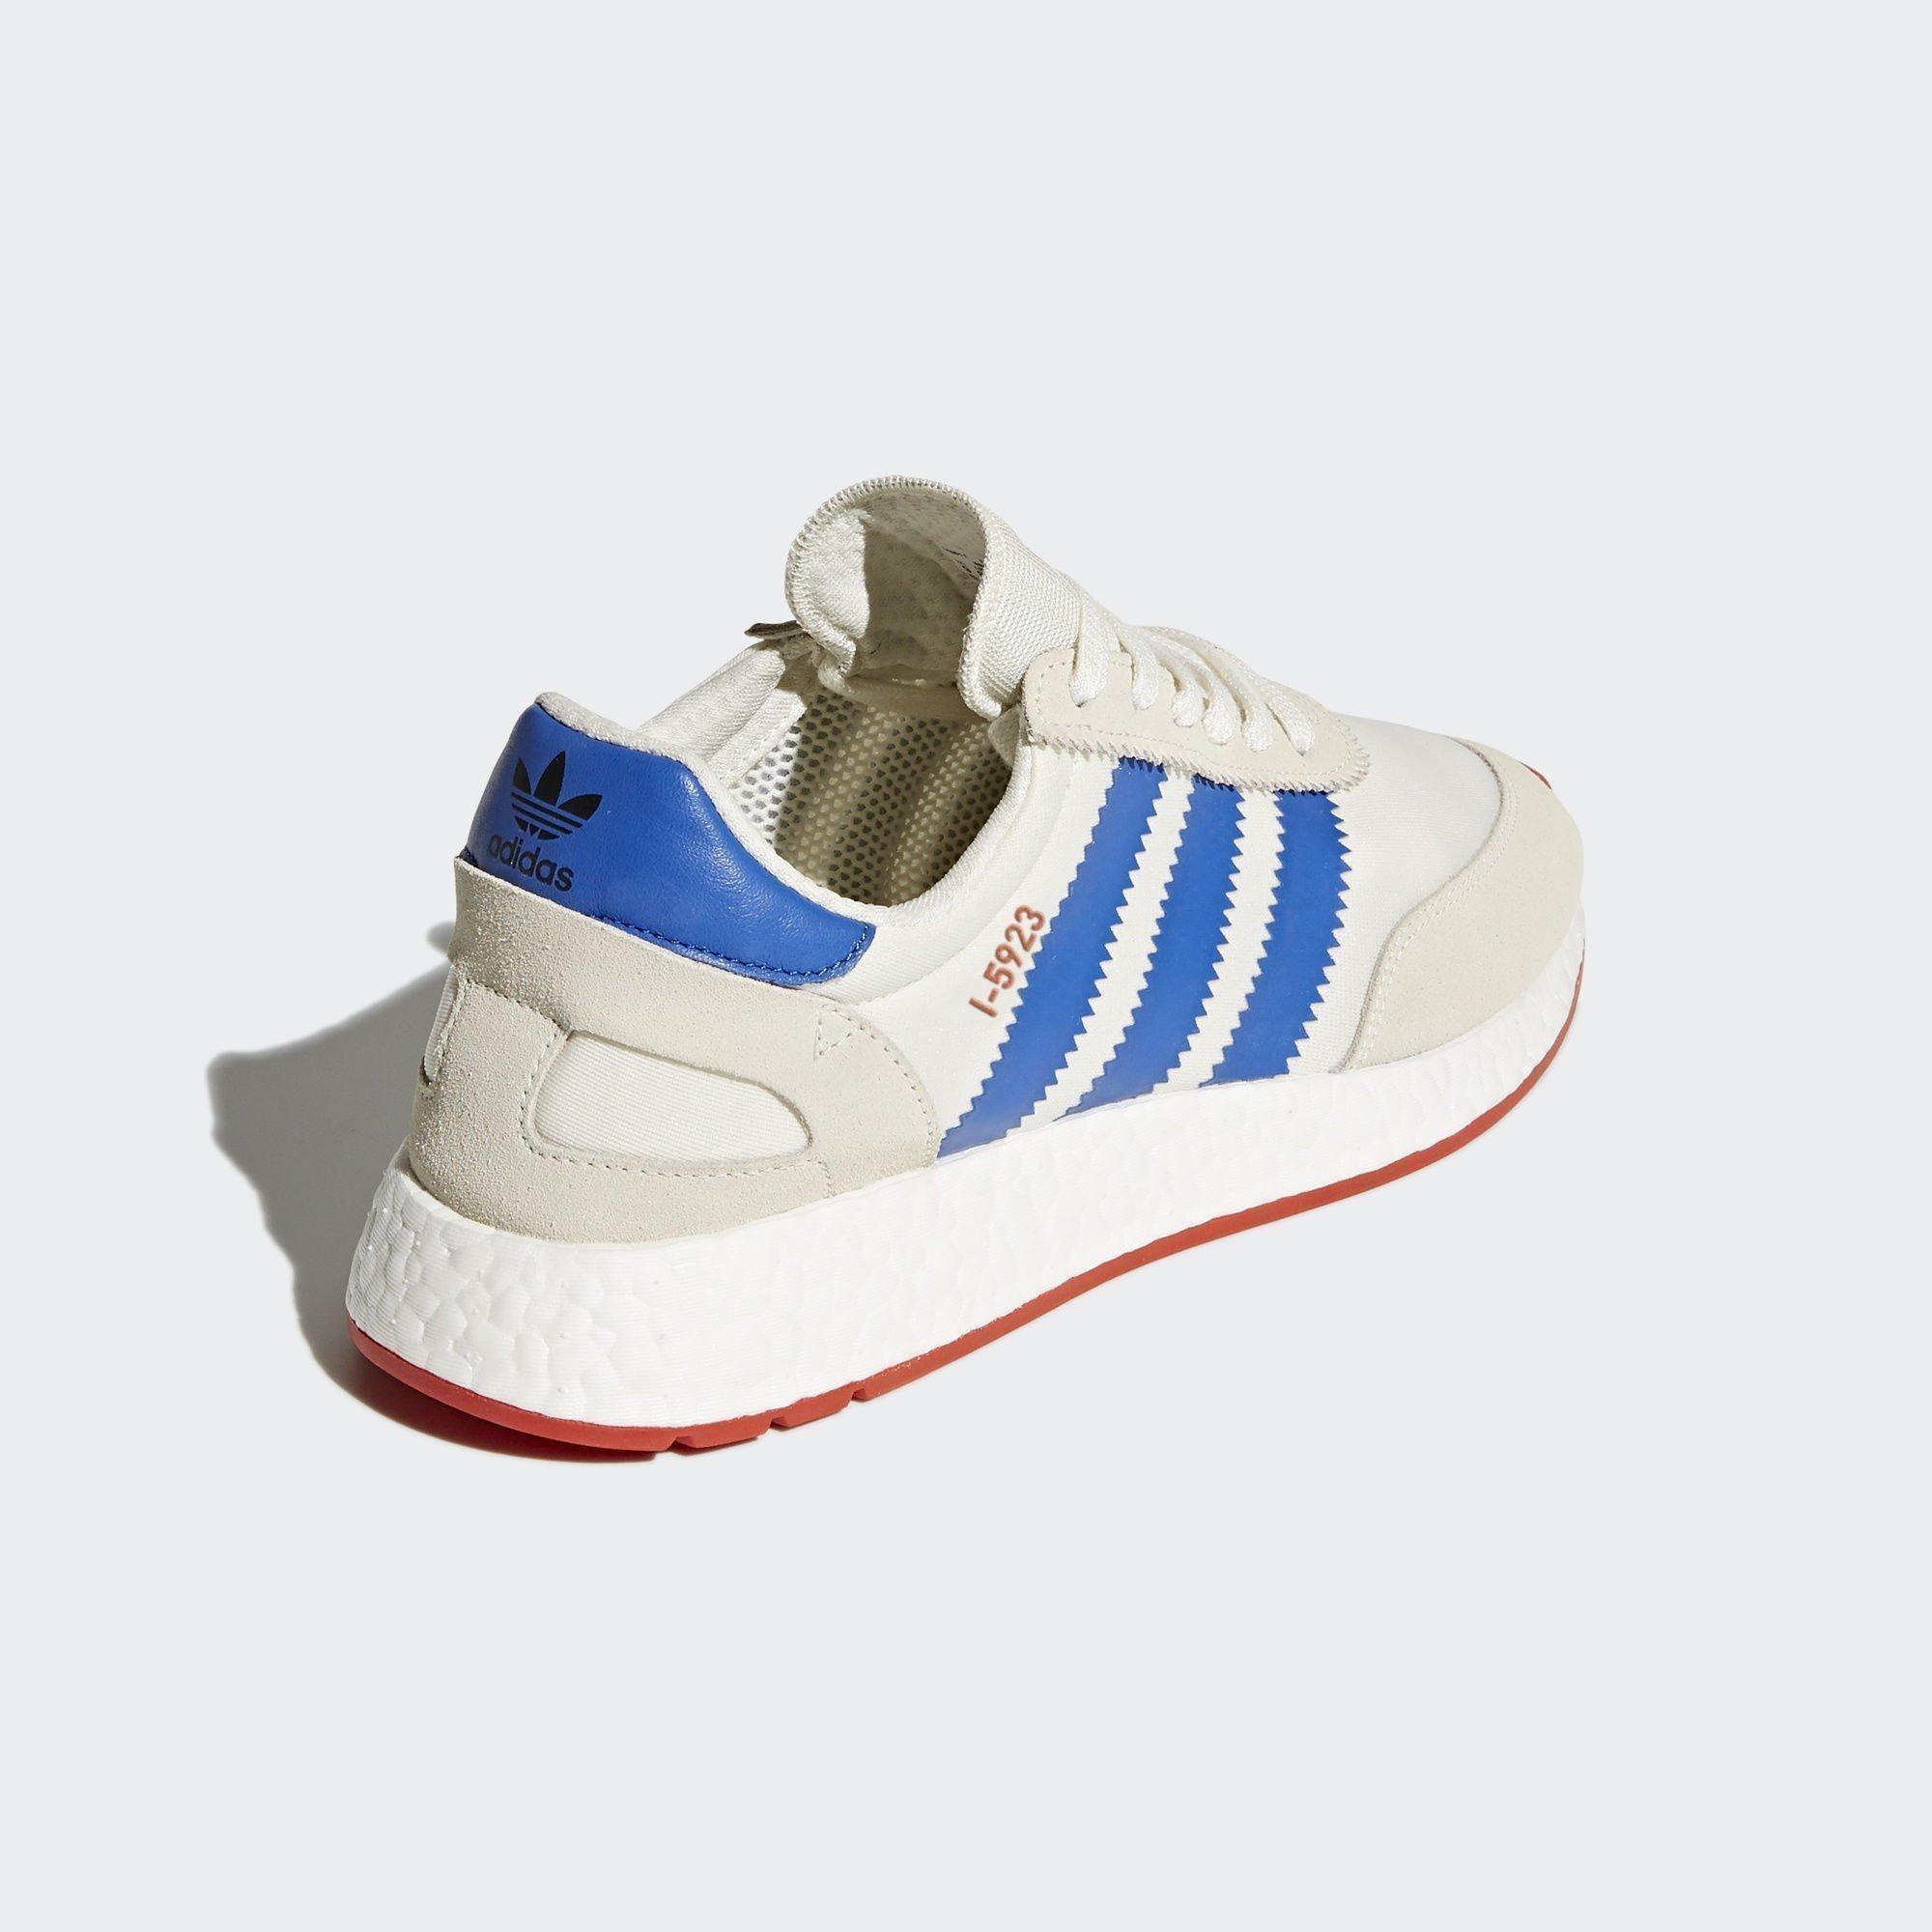 Adidas Iniki BB2093